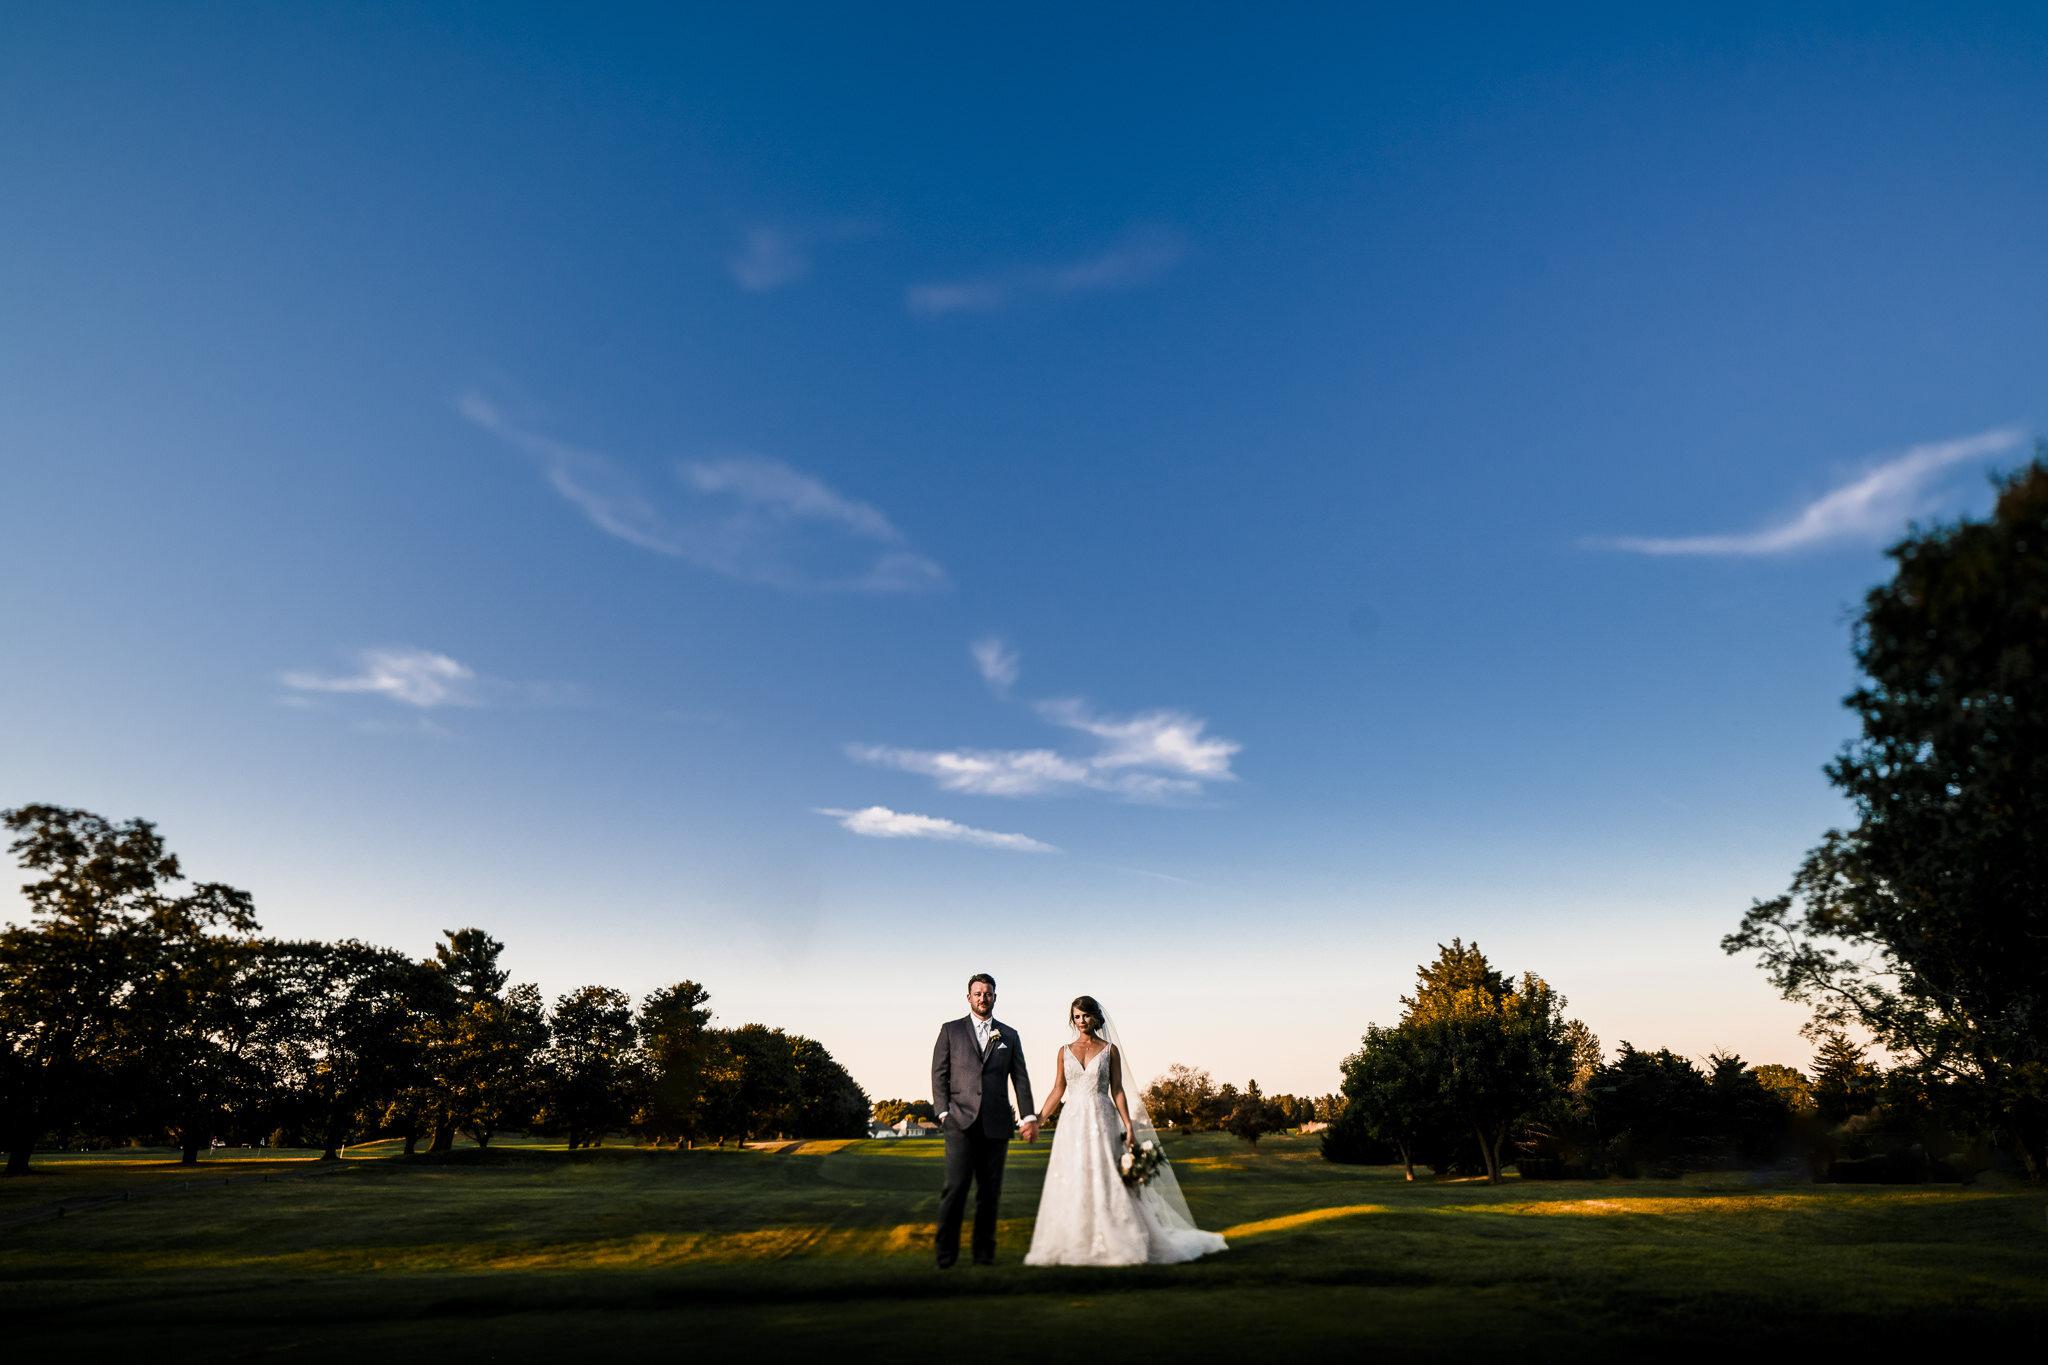 Coyle-Forsgate-Country-Club-Wedding-Photographer-28.JPG